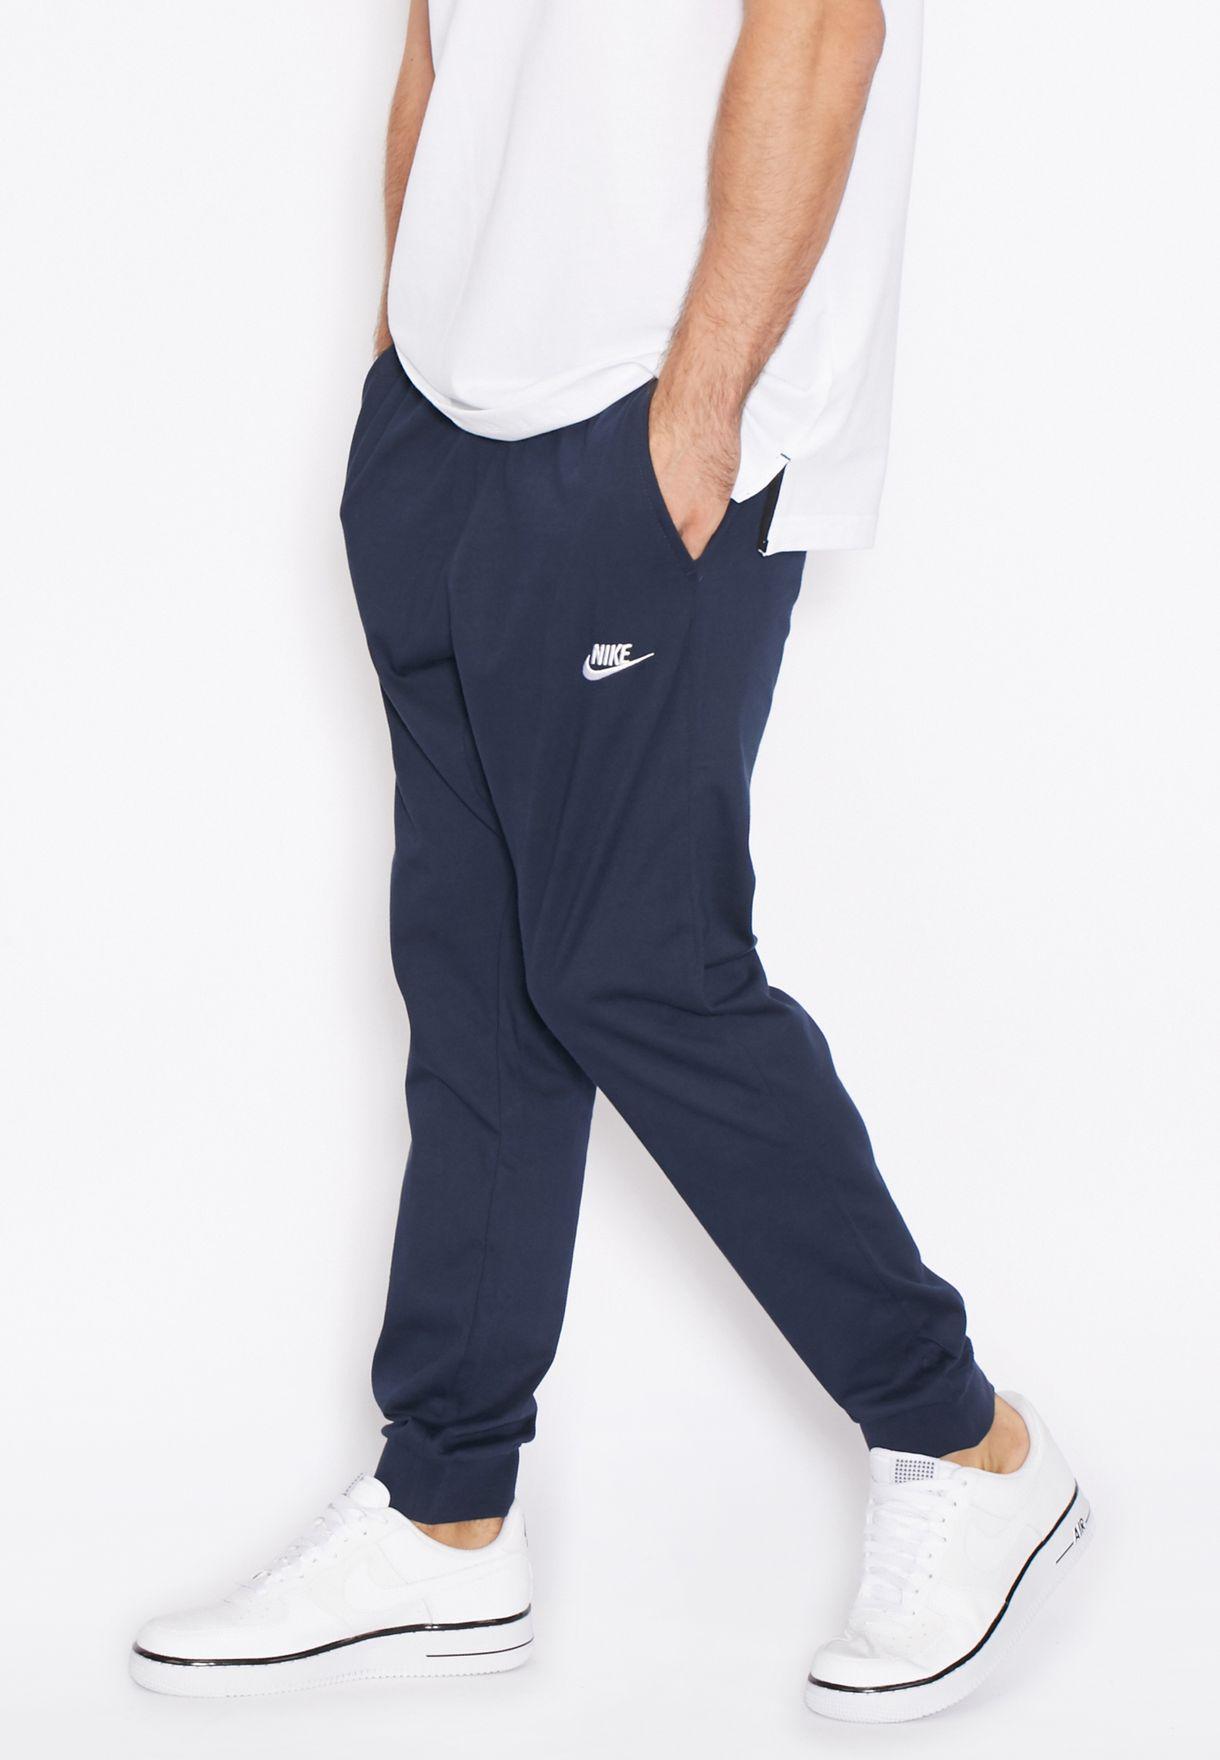 7d5435310225 Shop Nike navy Club Jersey Cuffed Sweatpants 804461-451 for Men in ...